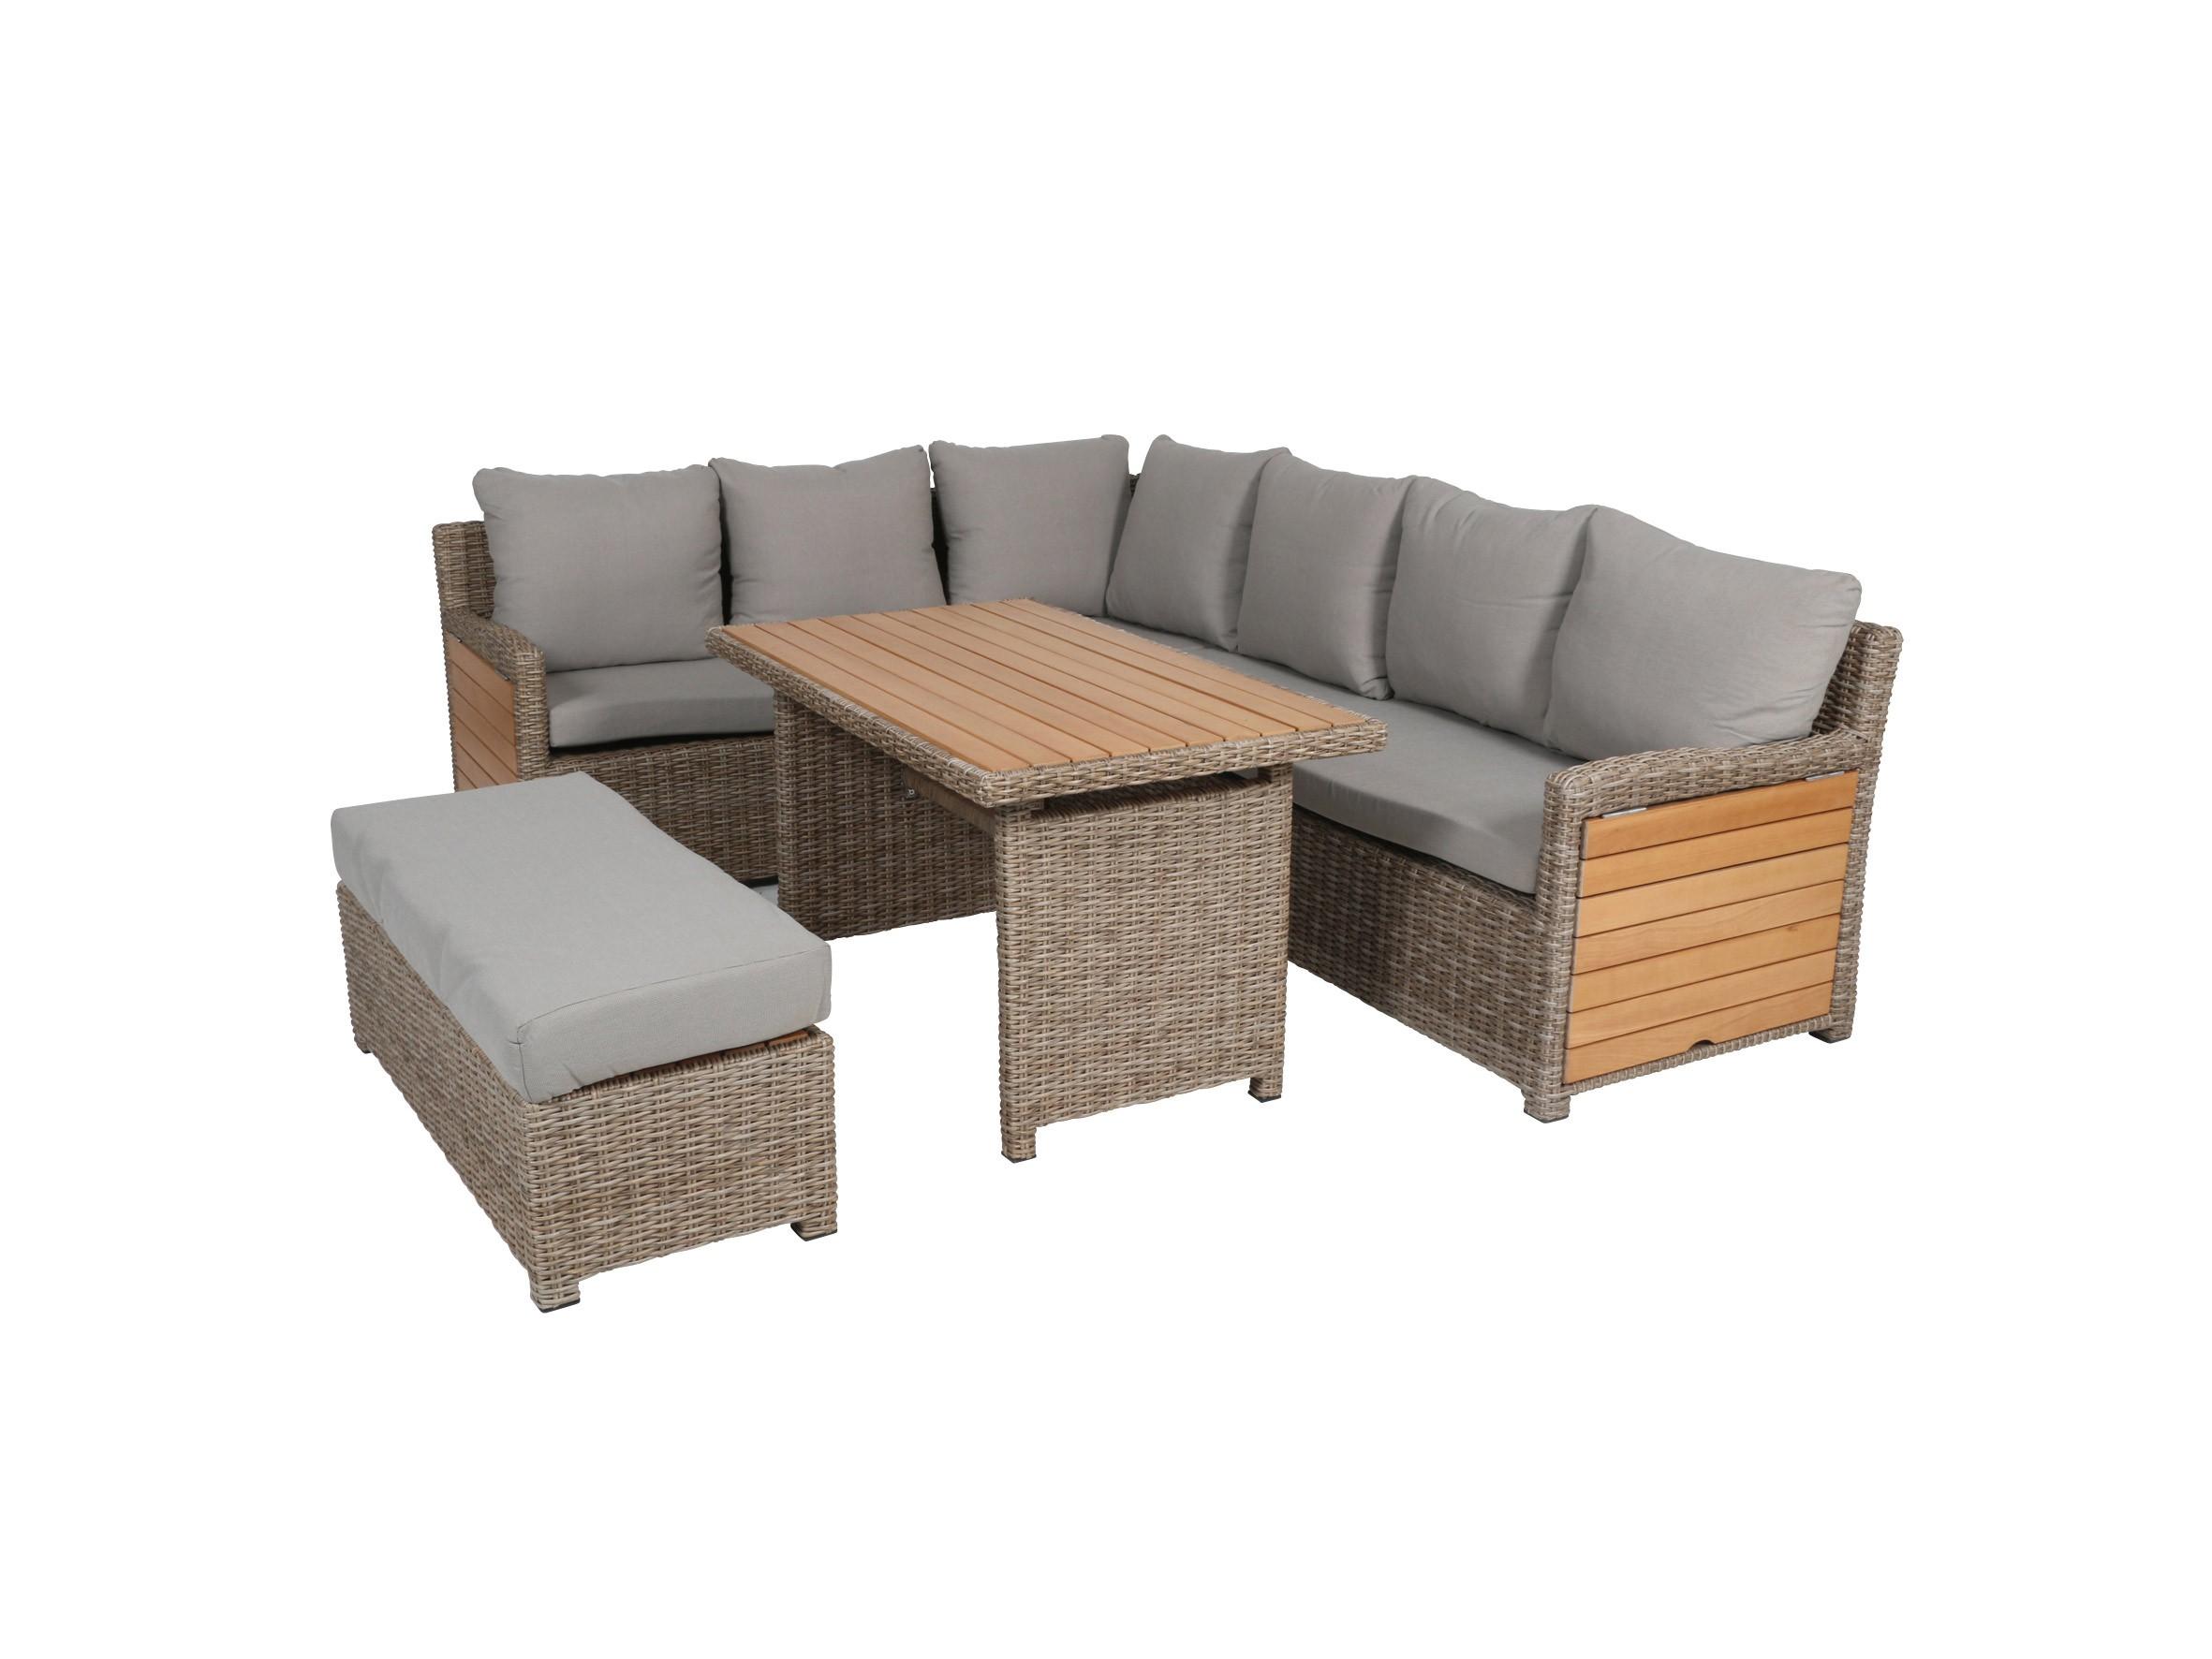 Gartenmobel Lounge Mobel Set Testrut Verona Polyrattan Akazienholz